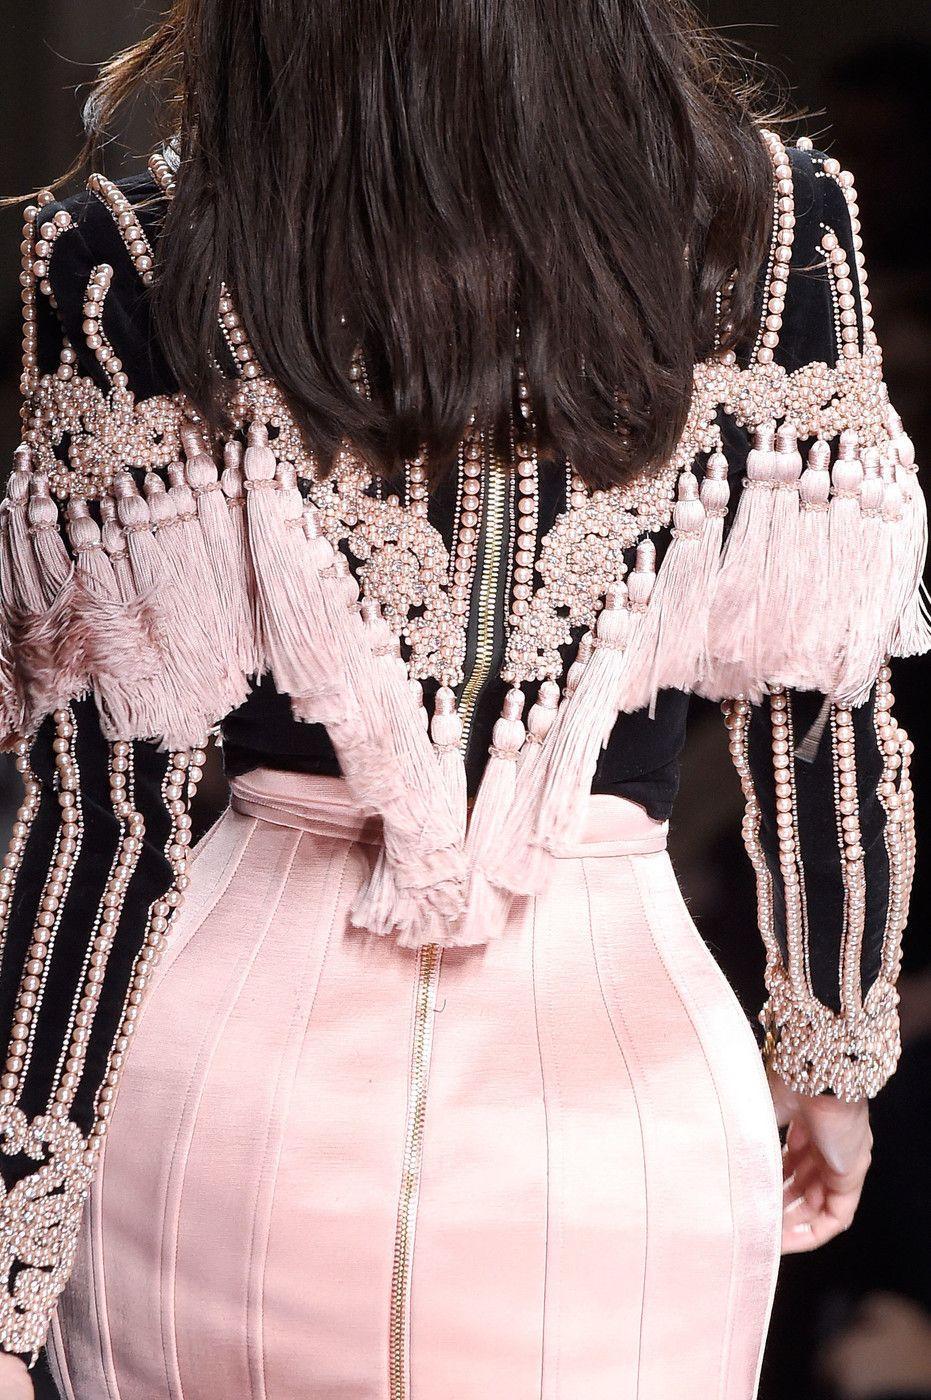 Balmain at Paris Fashion Week Fall 2016